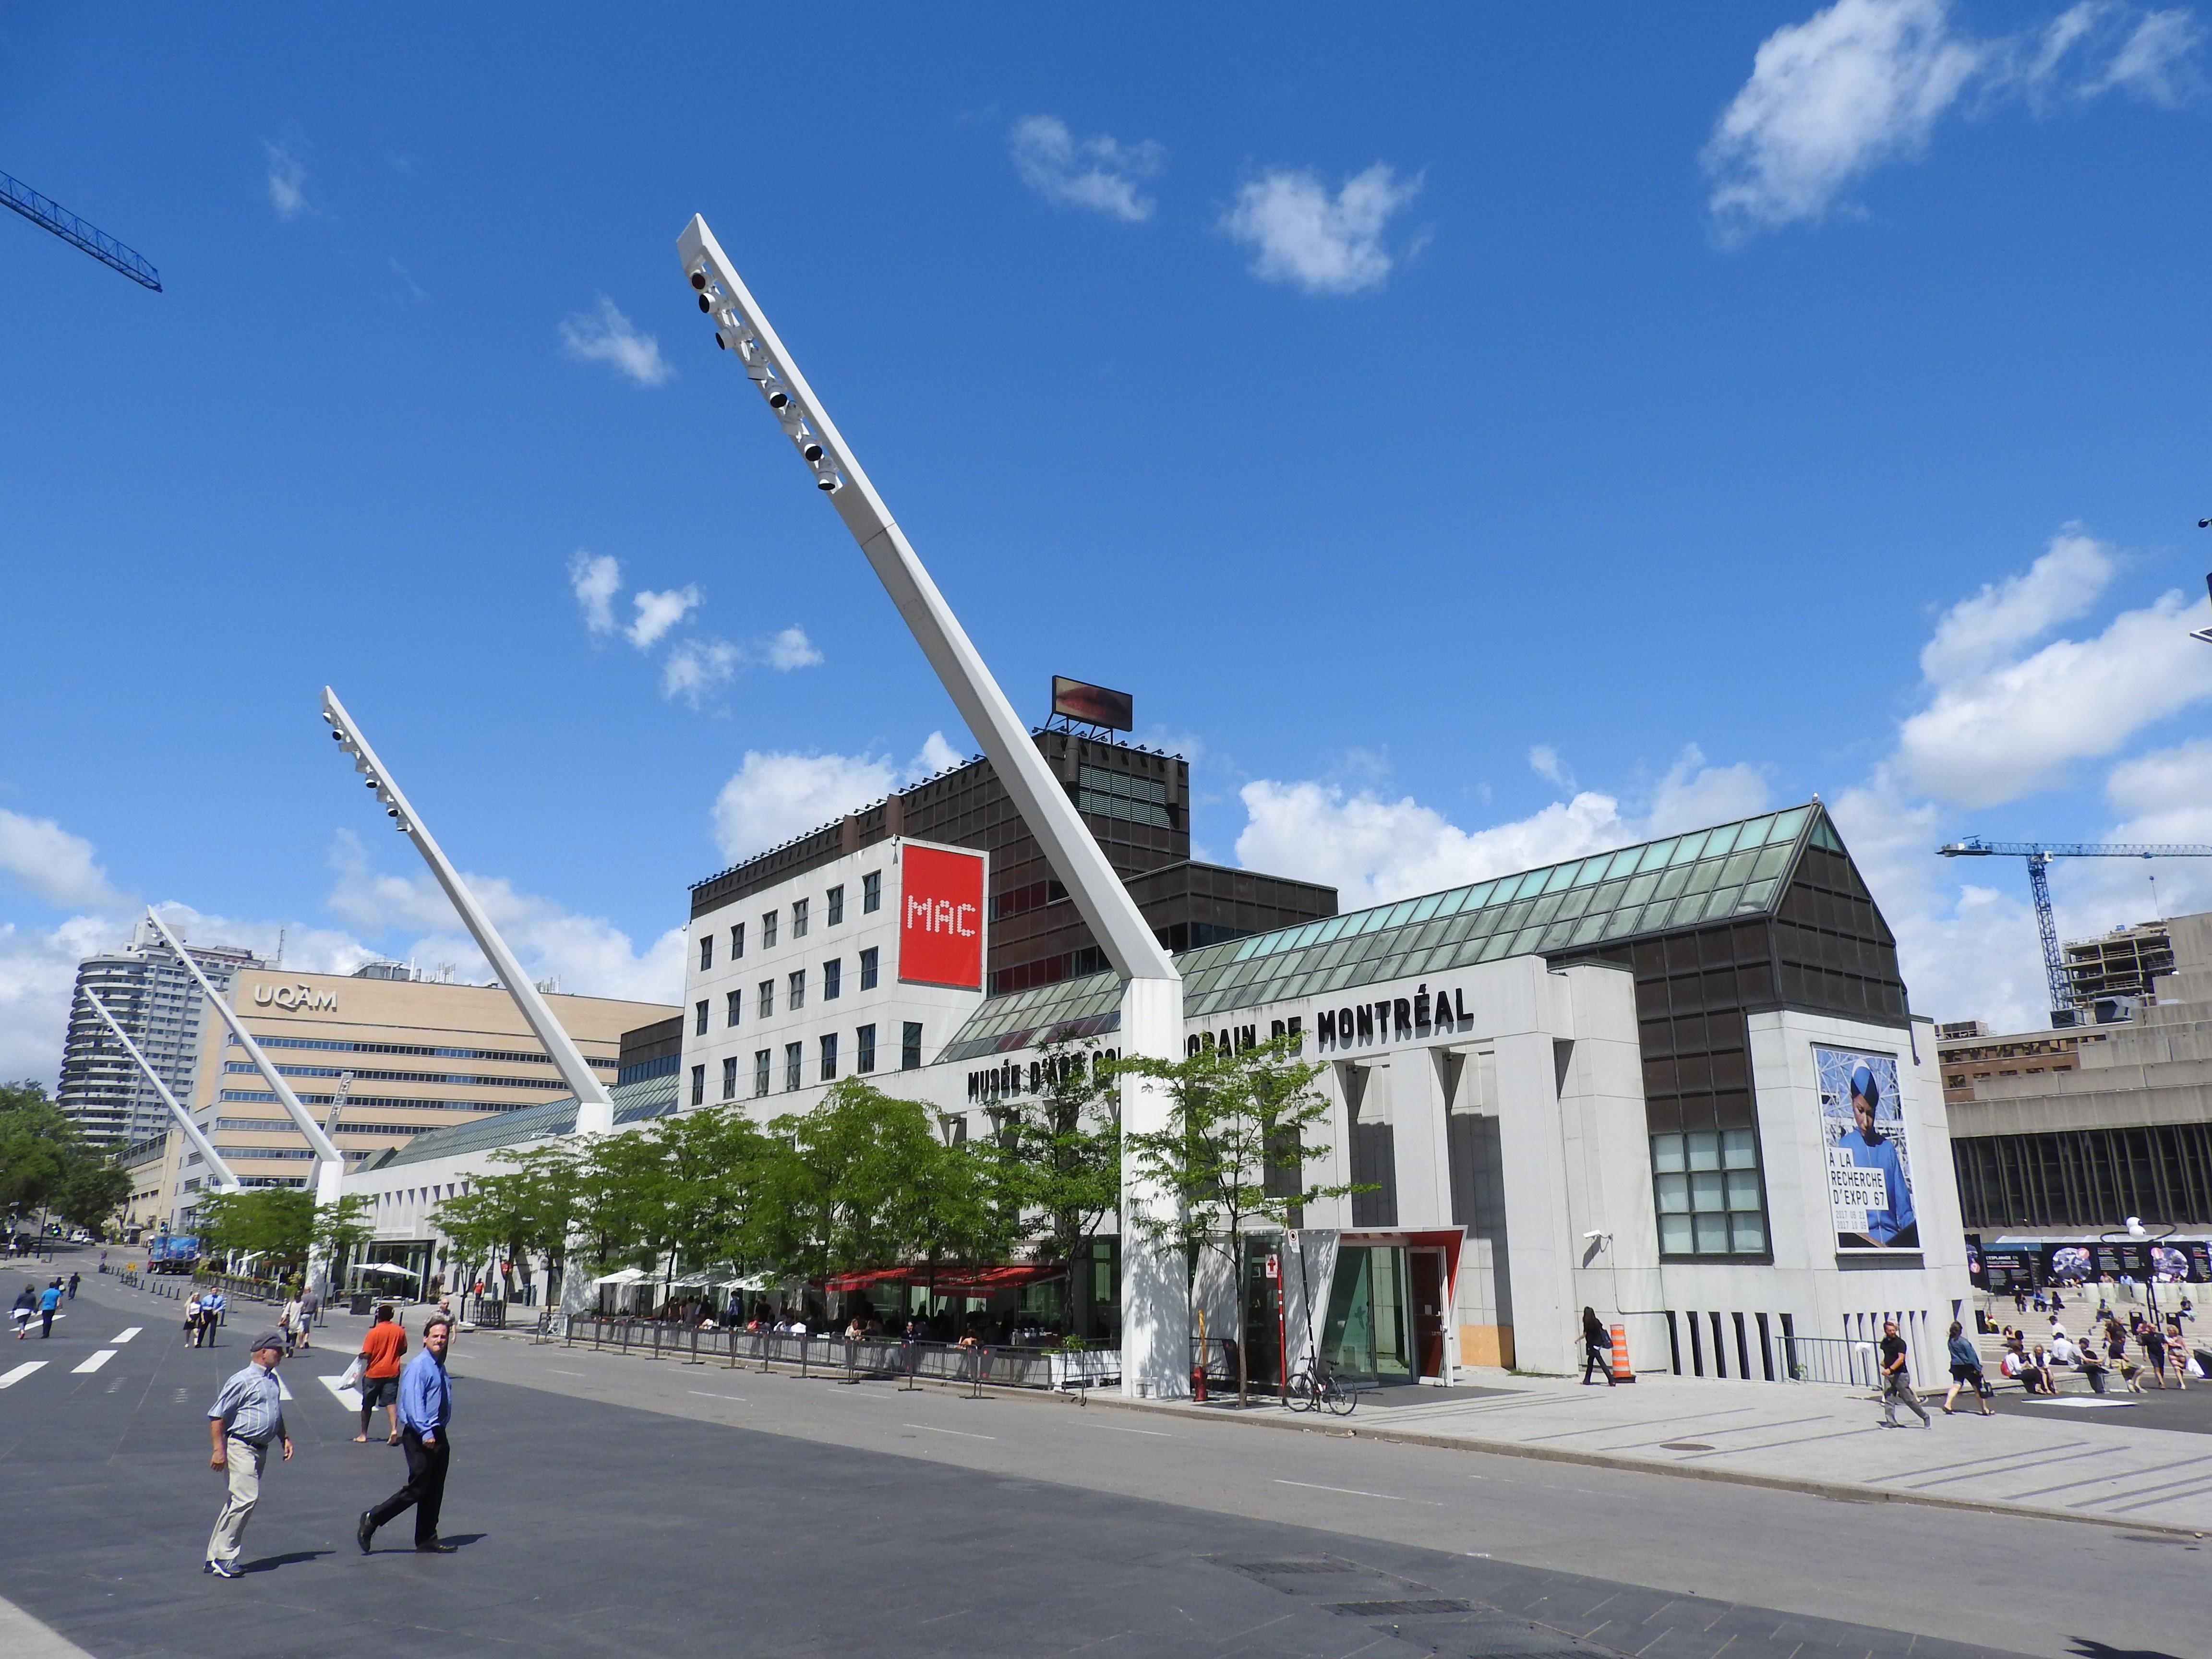 Montreal Museum Of Modern Art